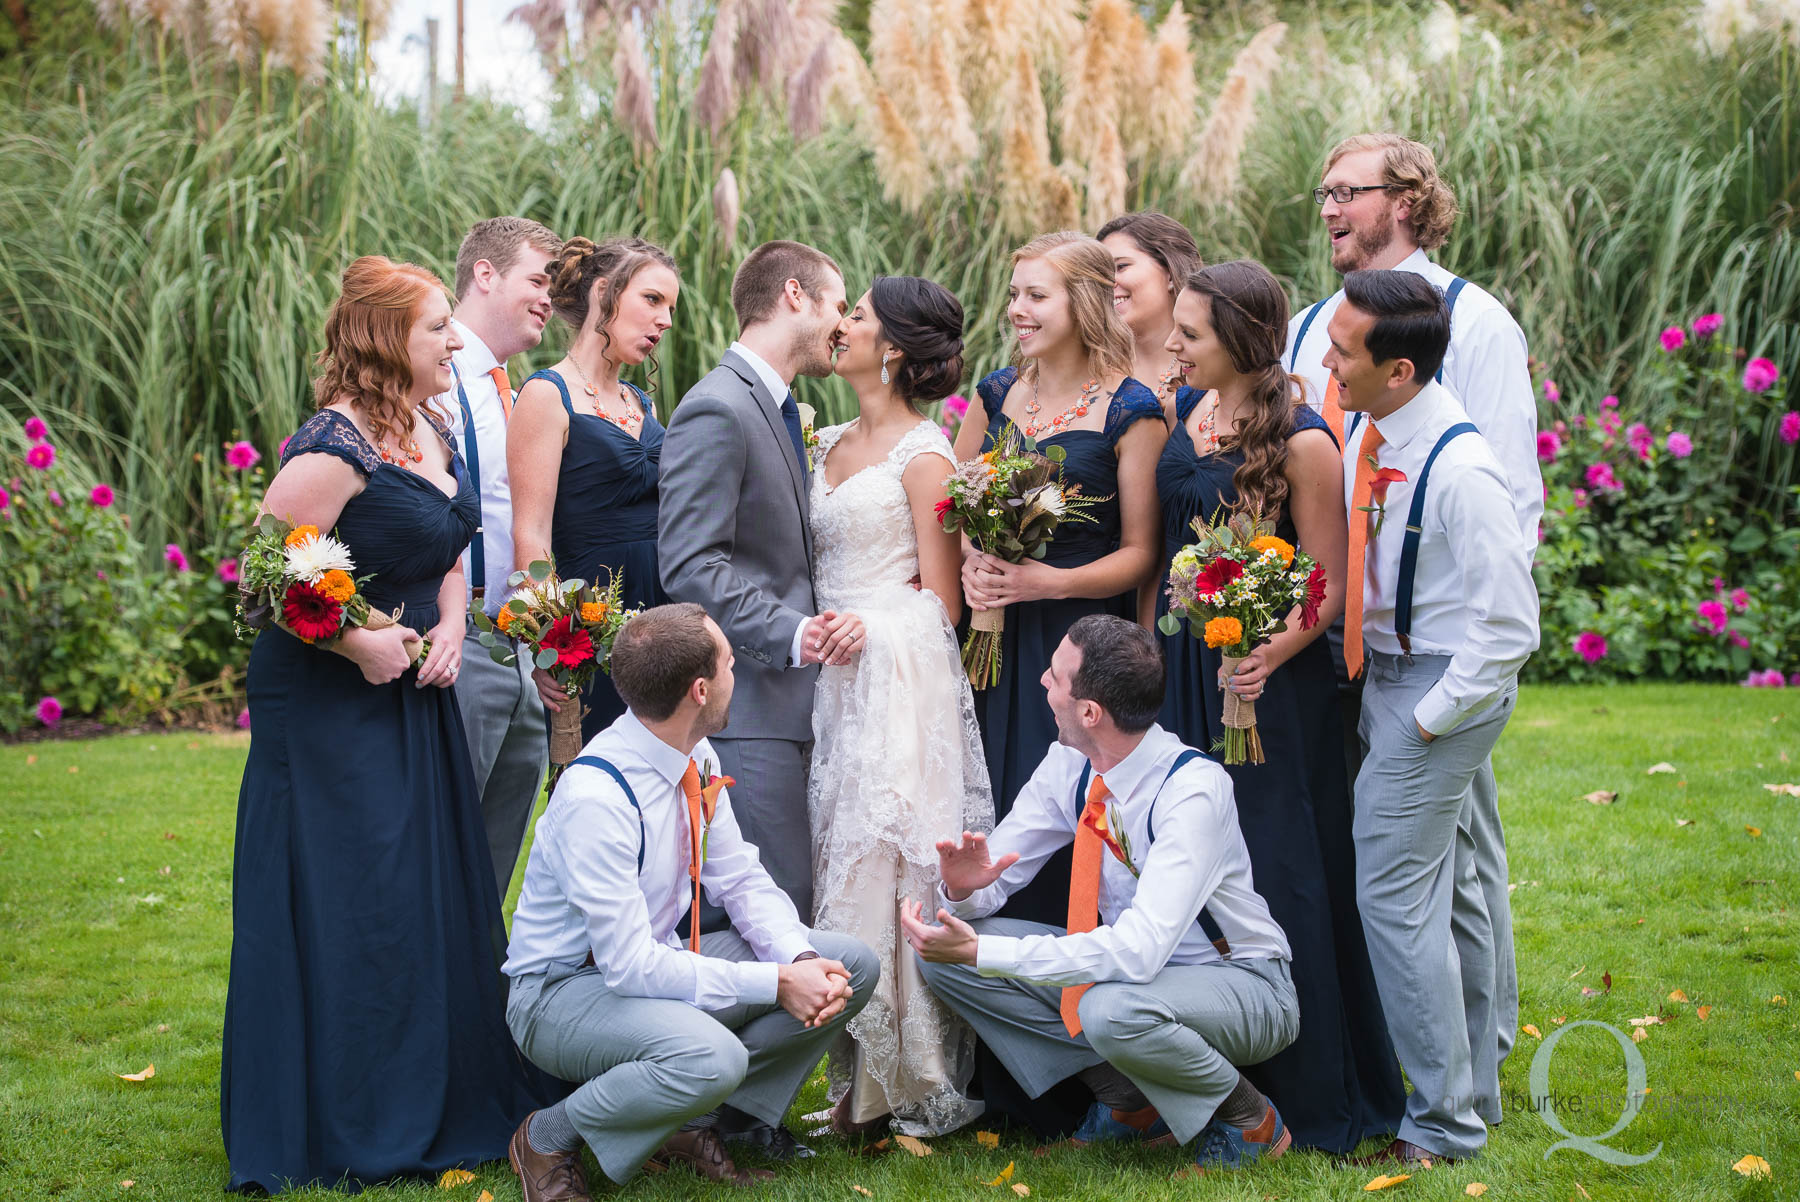 Green Villa Barn wedding party bride and groom kissing